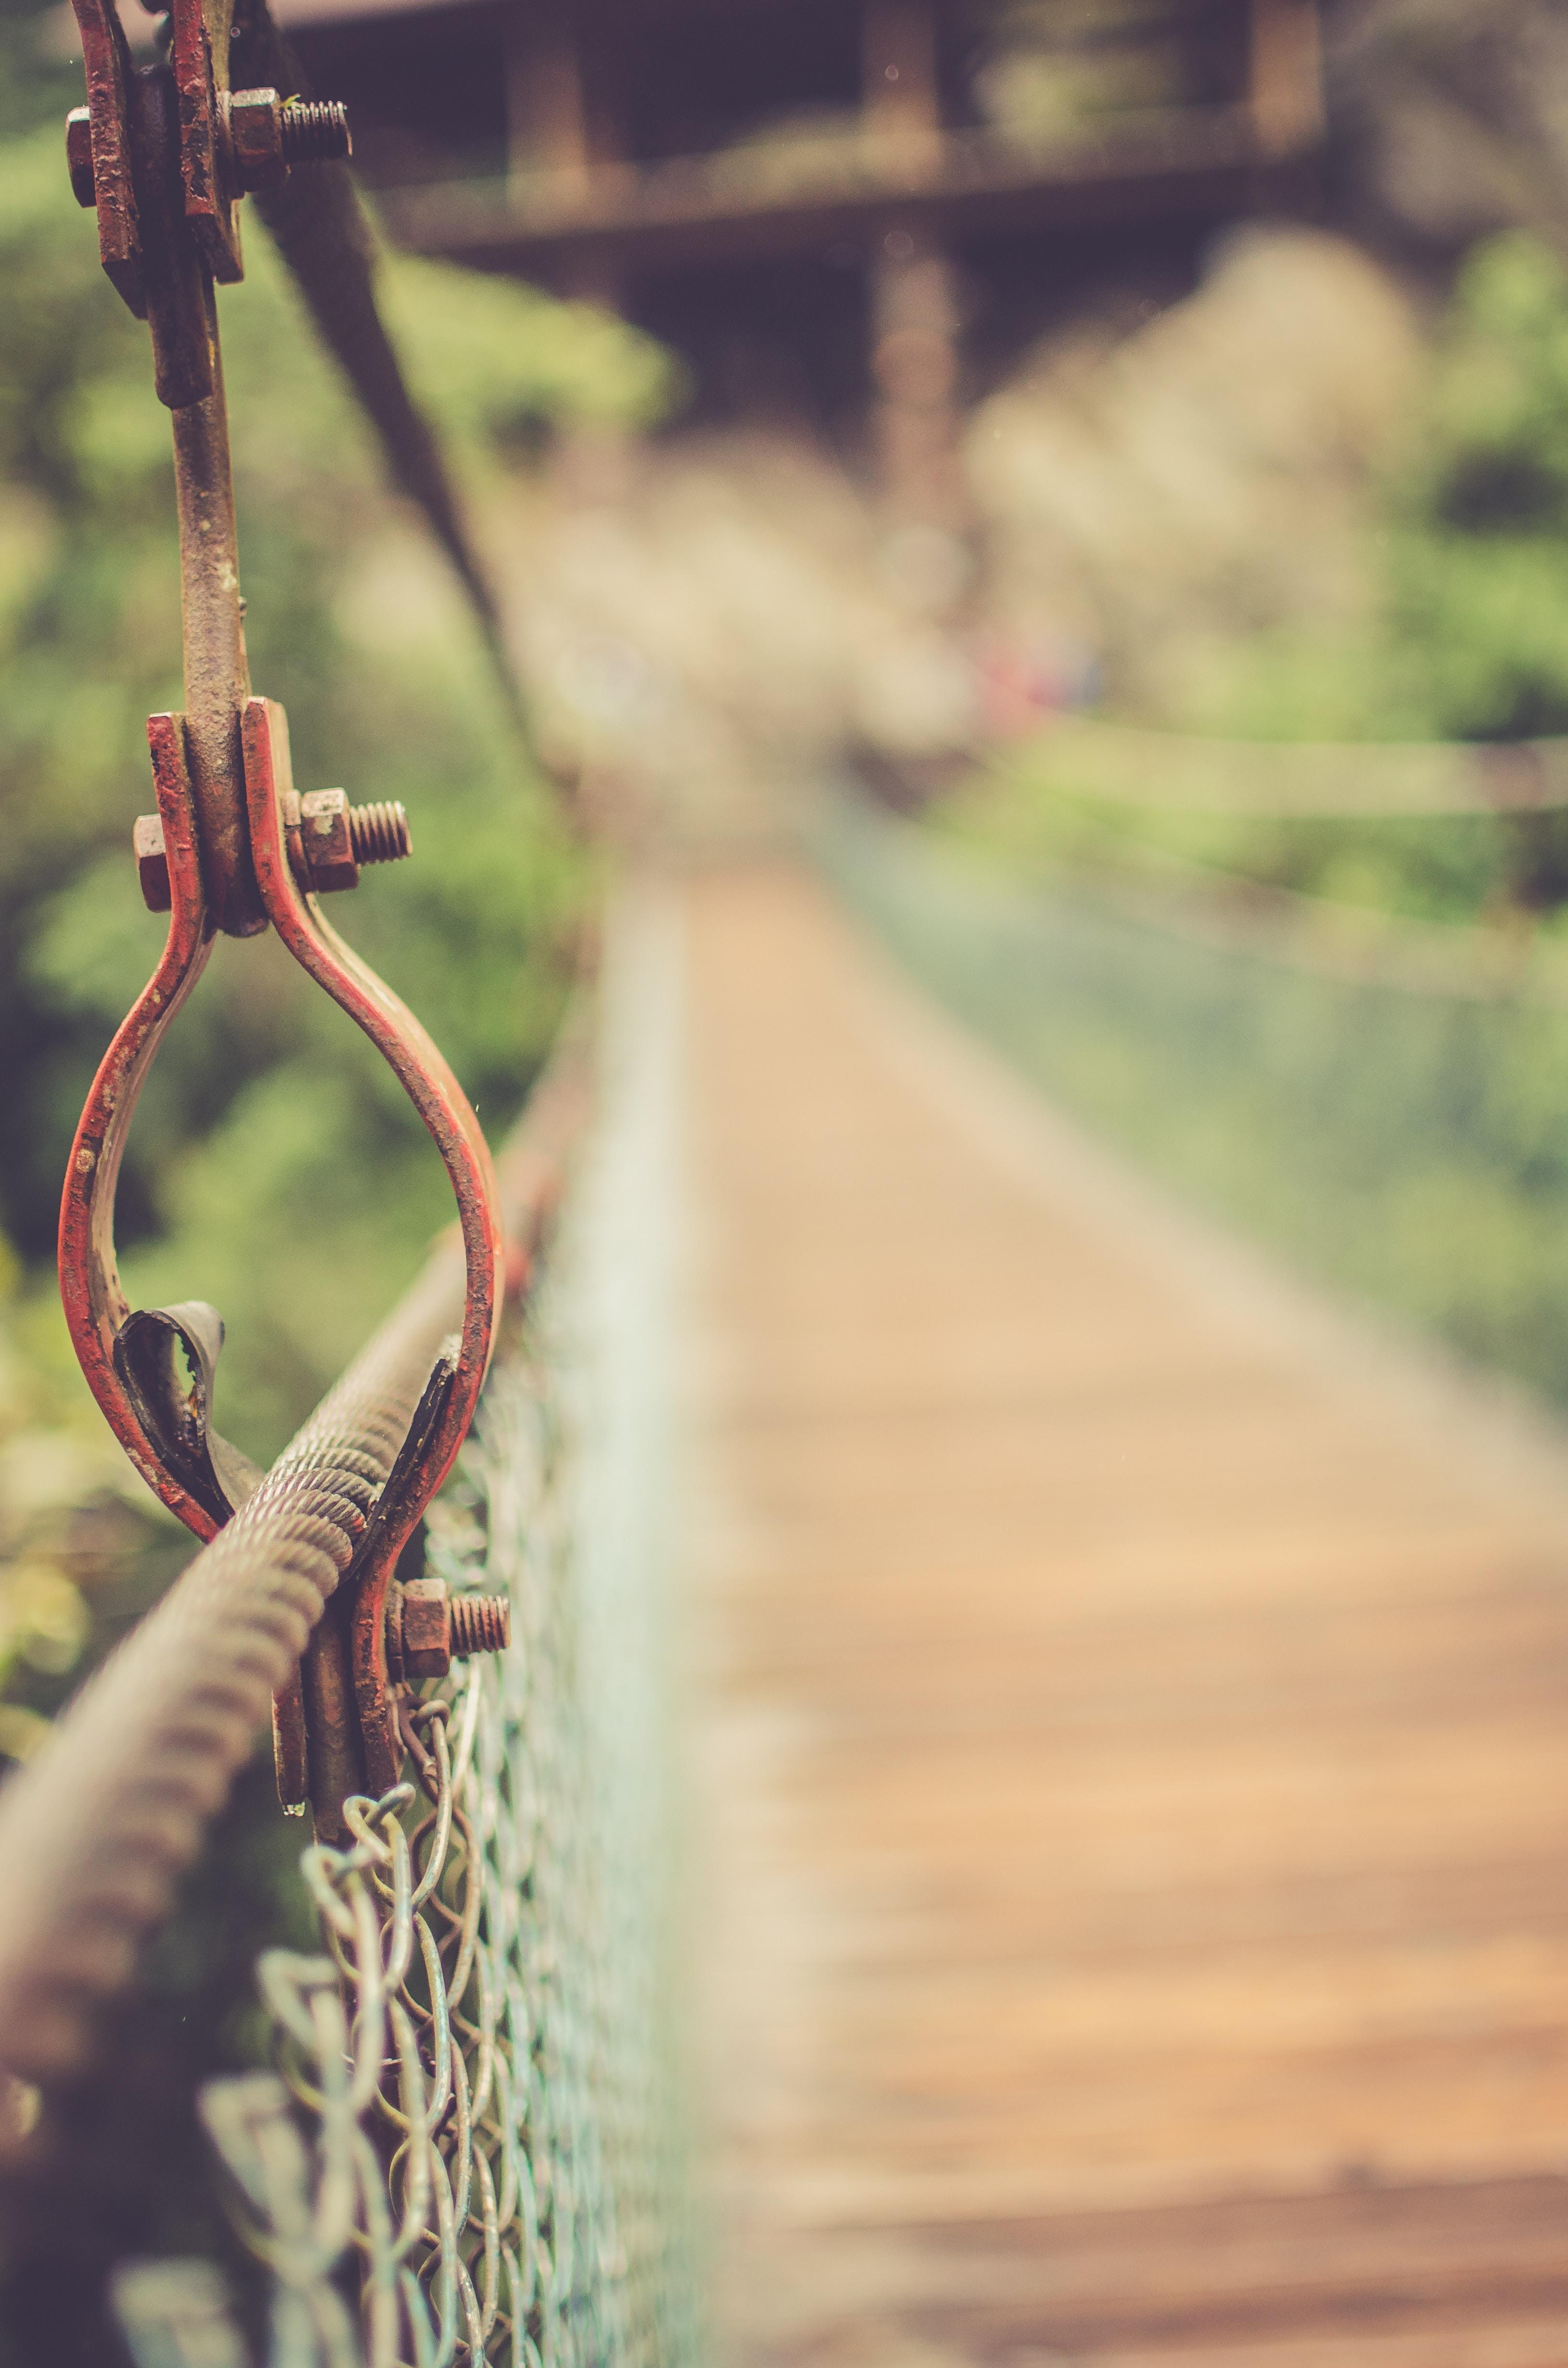 Metal details on a suspension foot bridge